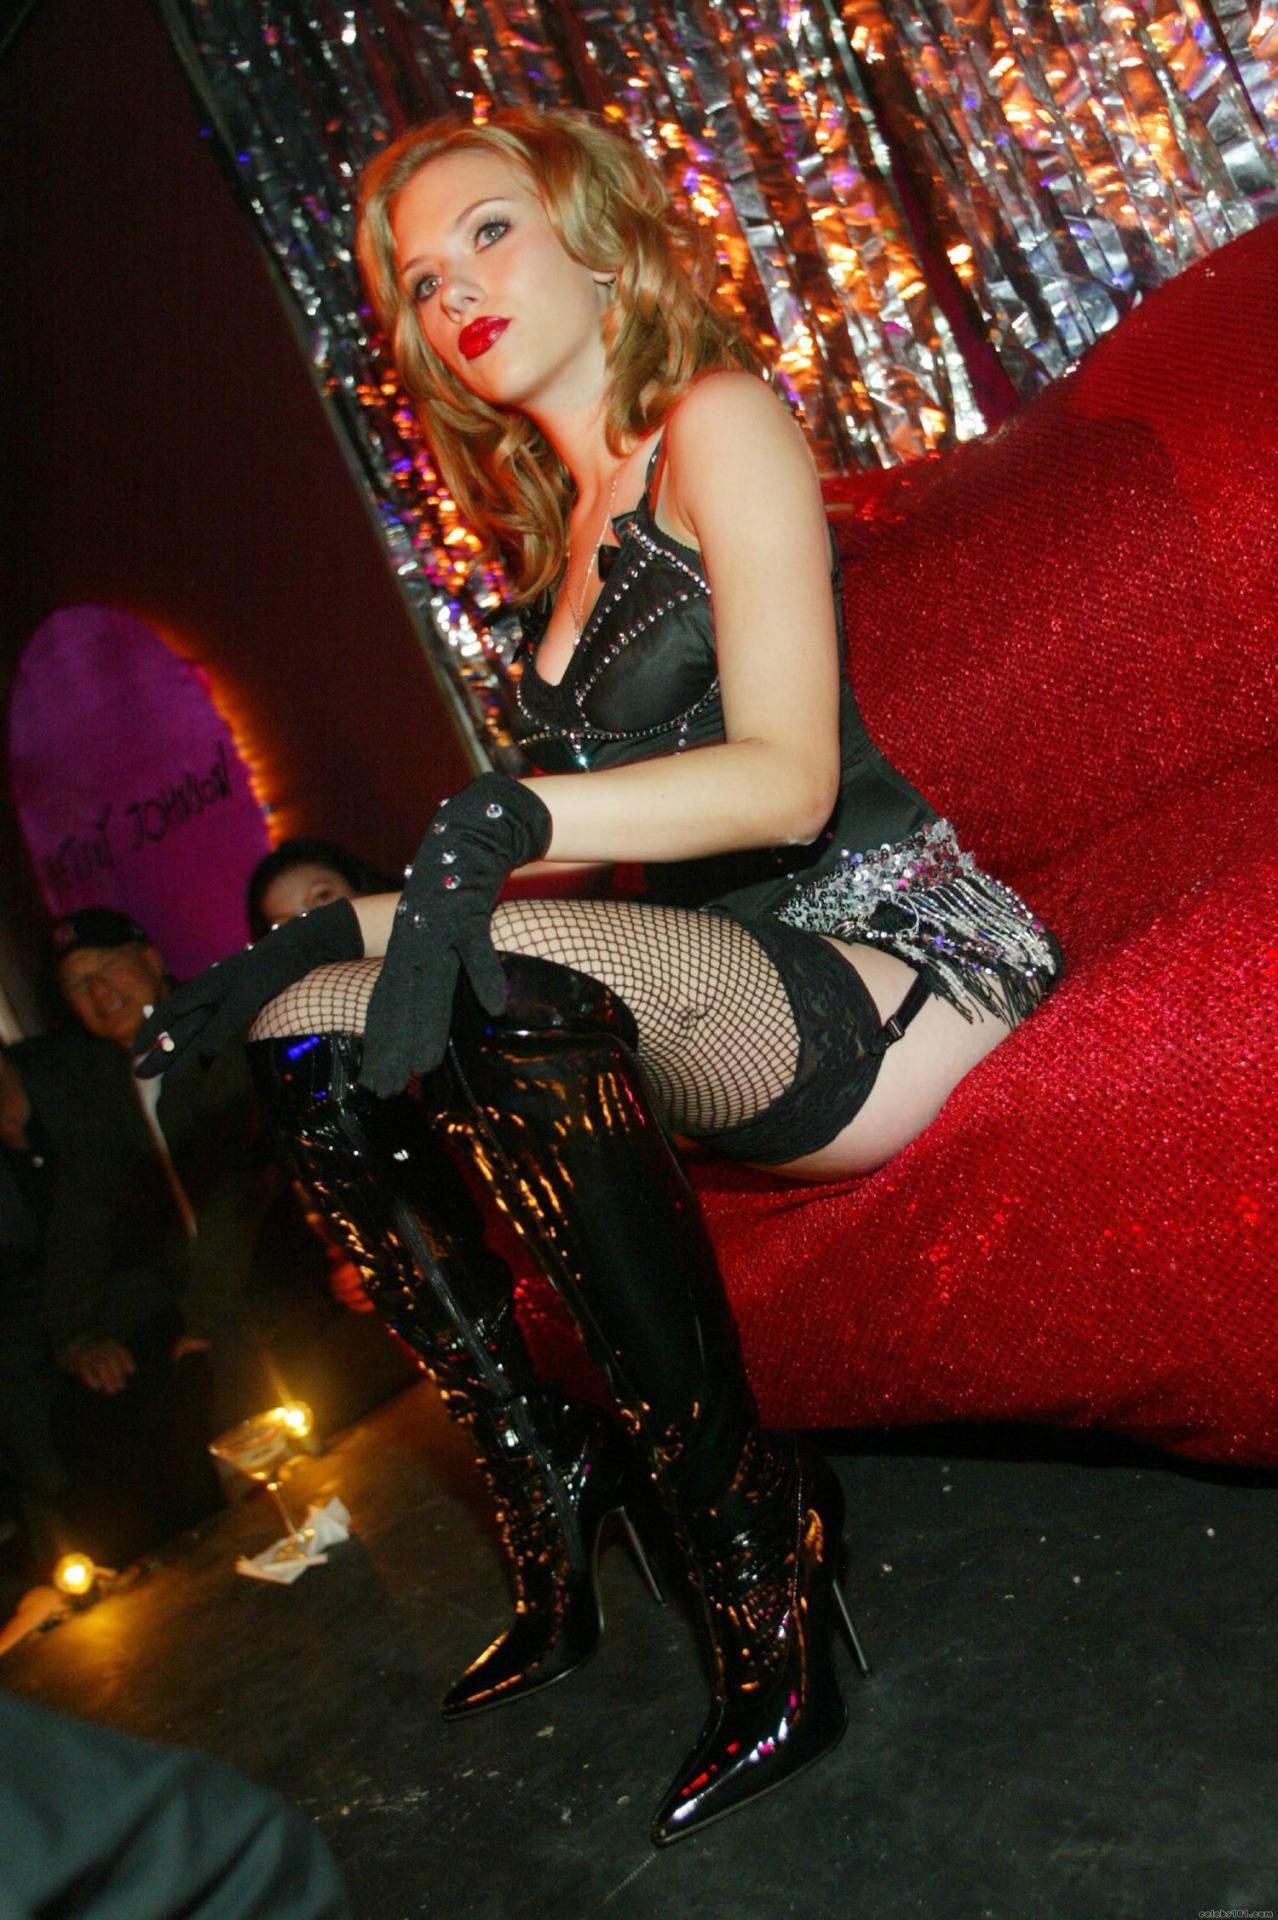 Scarlett Johansson At A Party